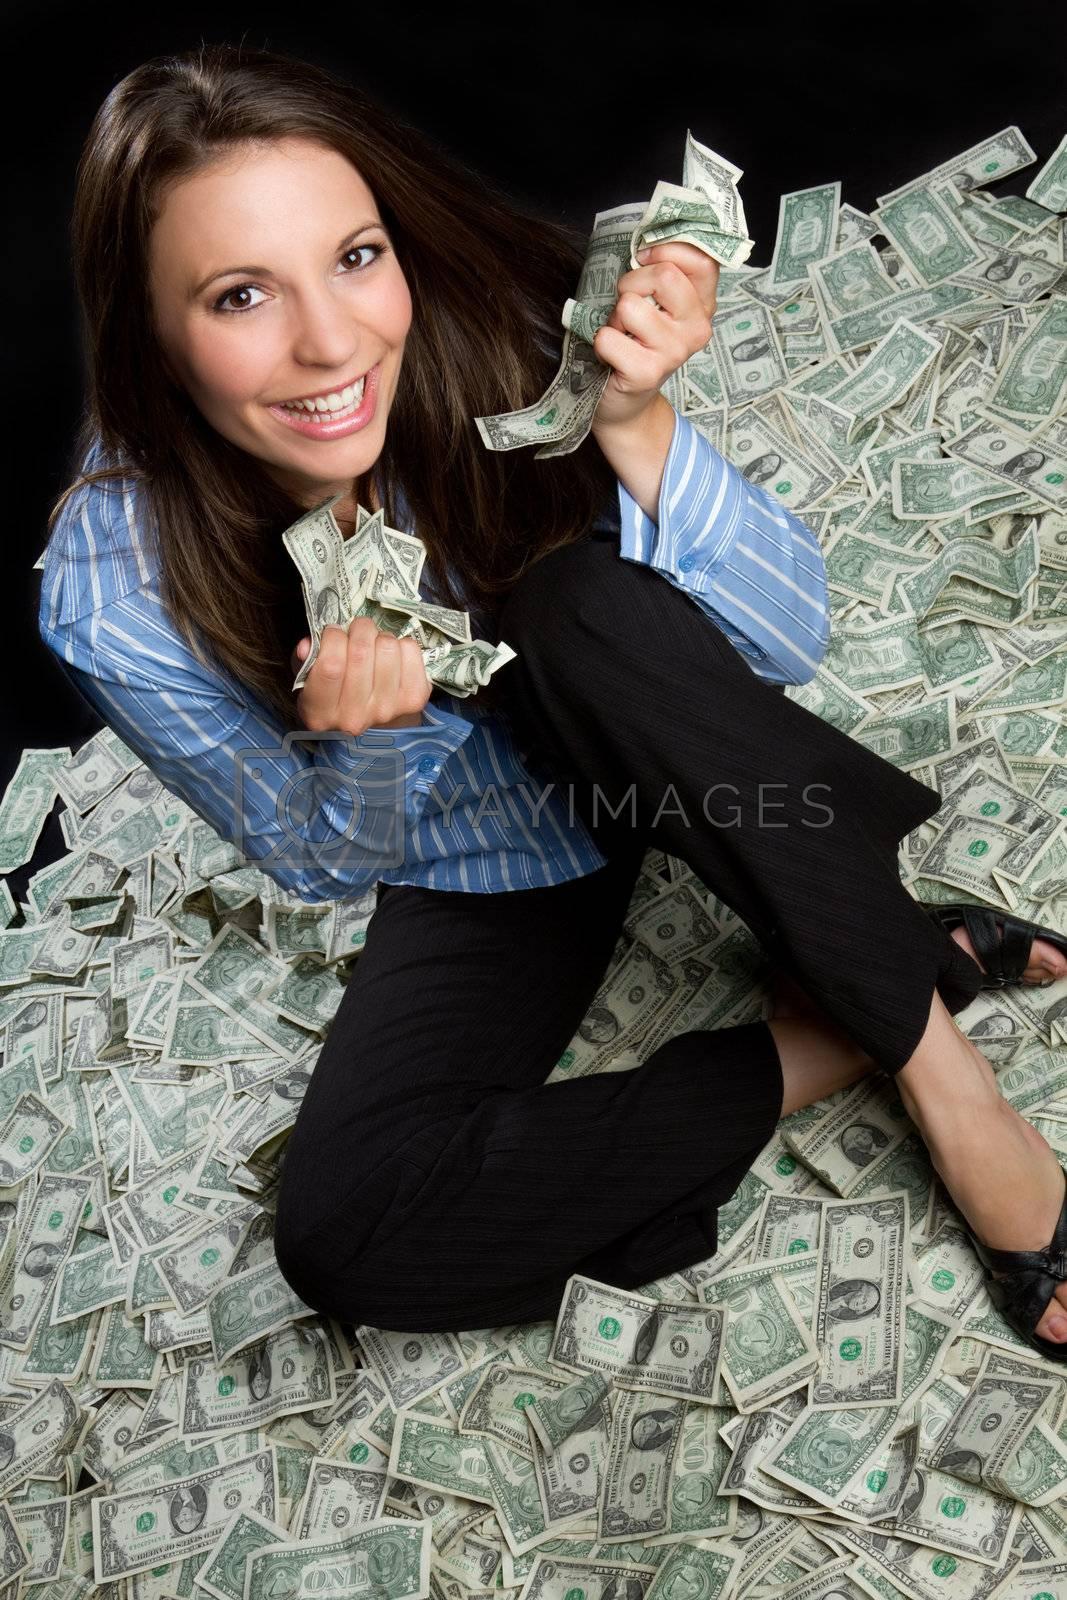 Beautiful smiling woman holding money